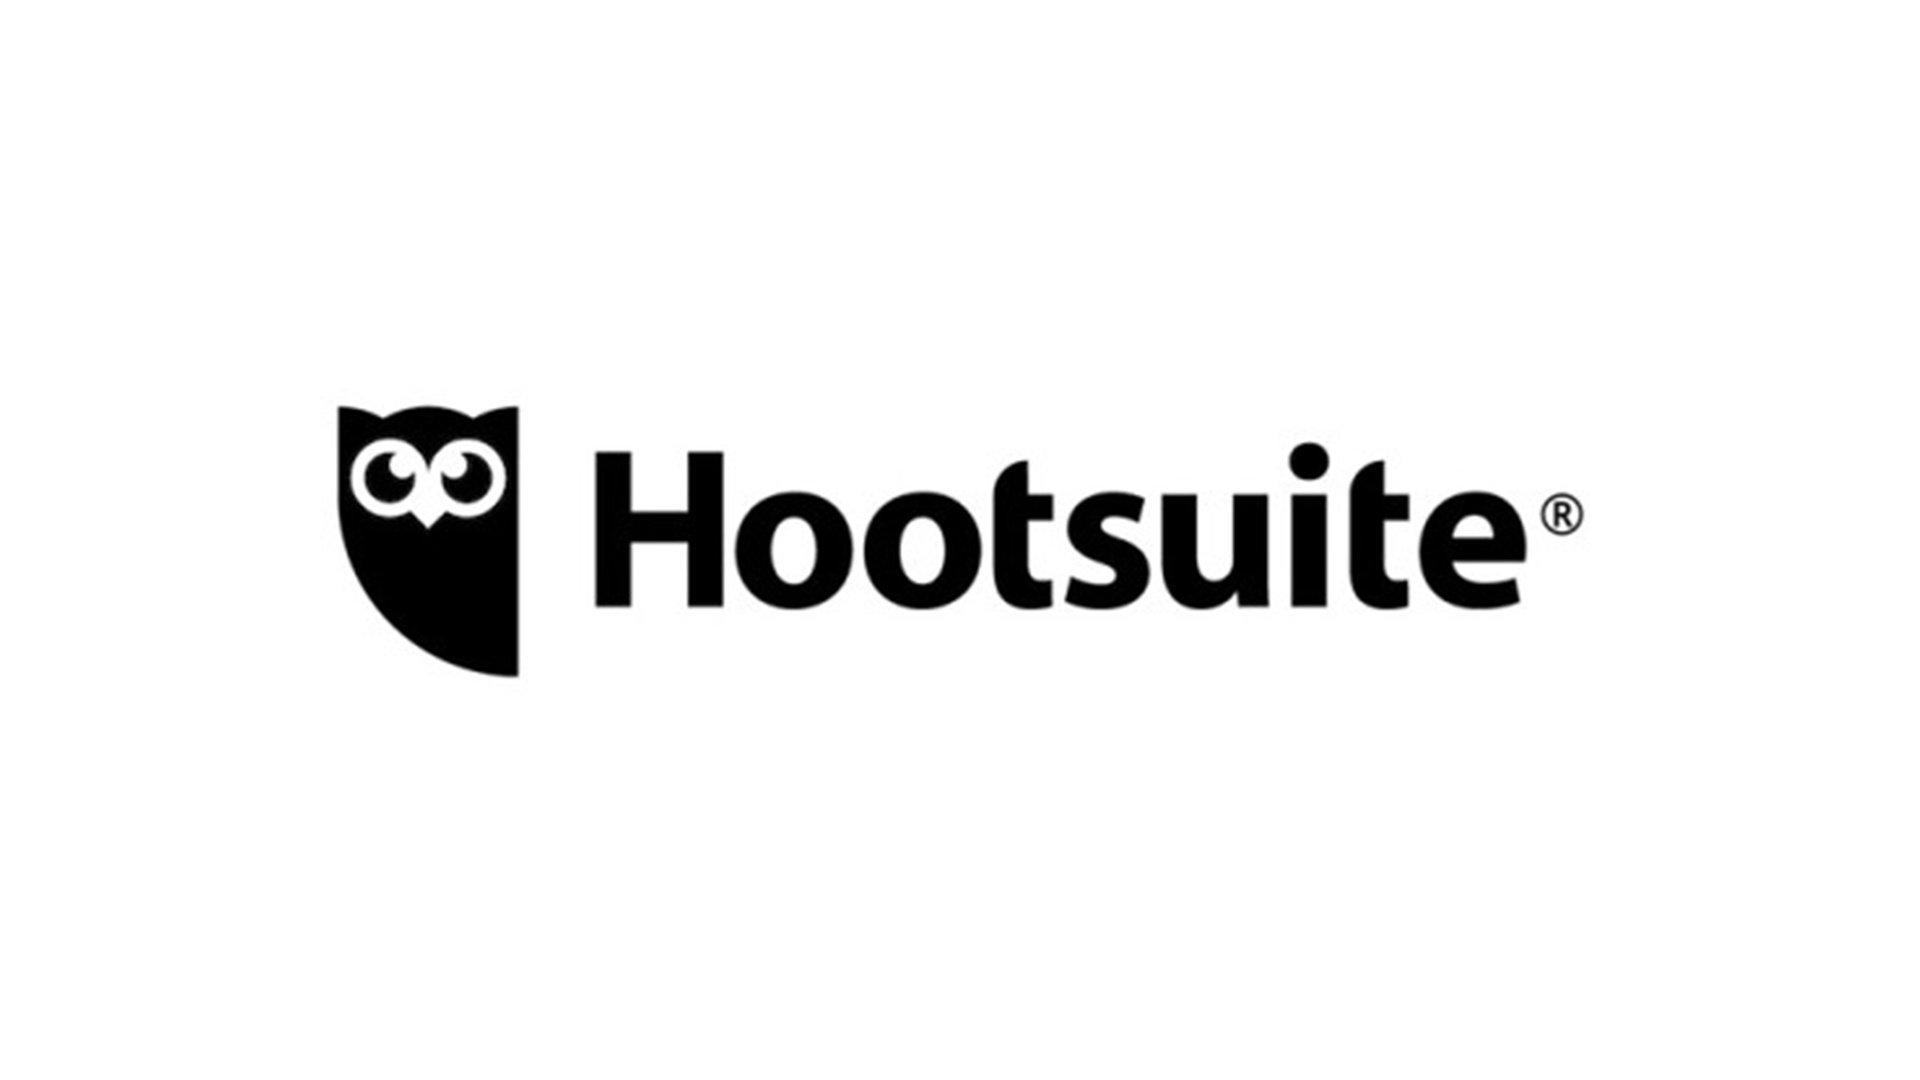 Content Marketing All-Stars Q&A:Eva Taylor of Hootsuite